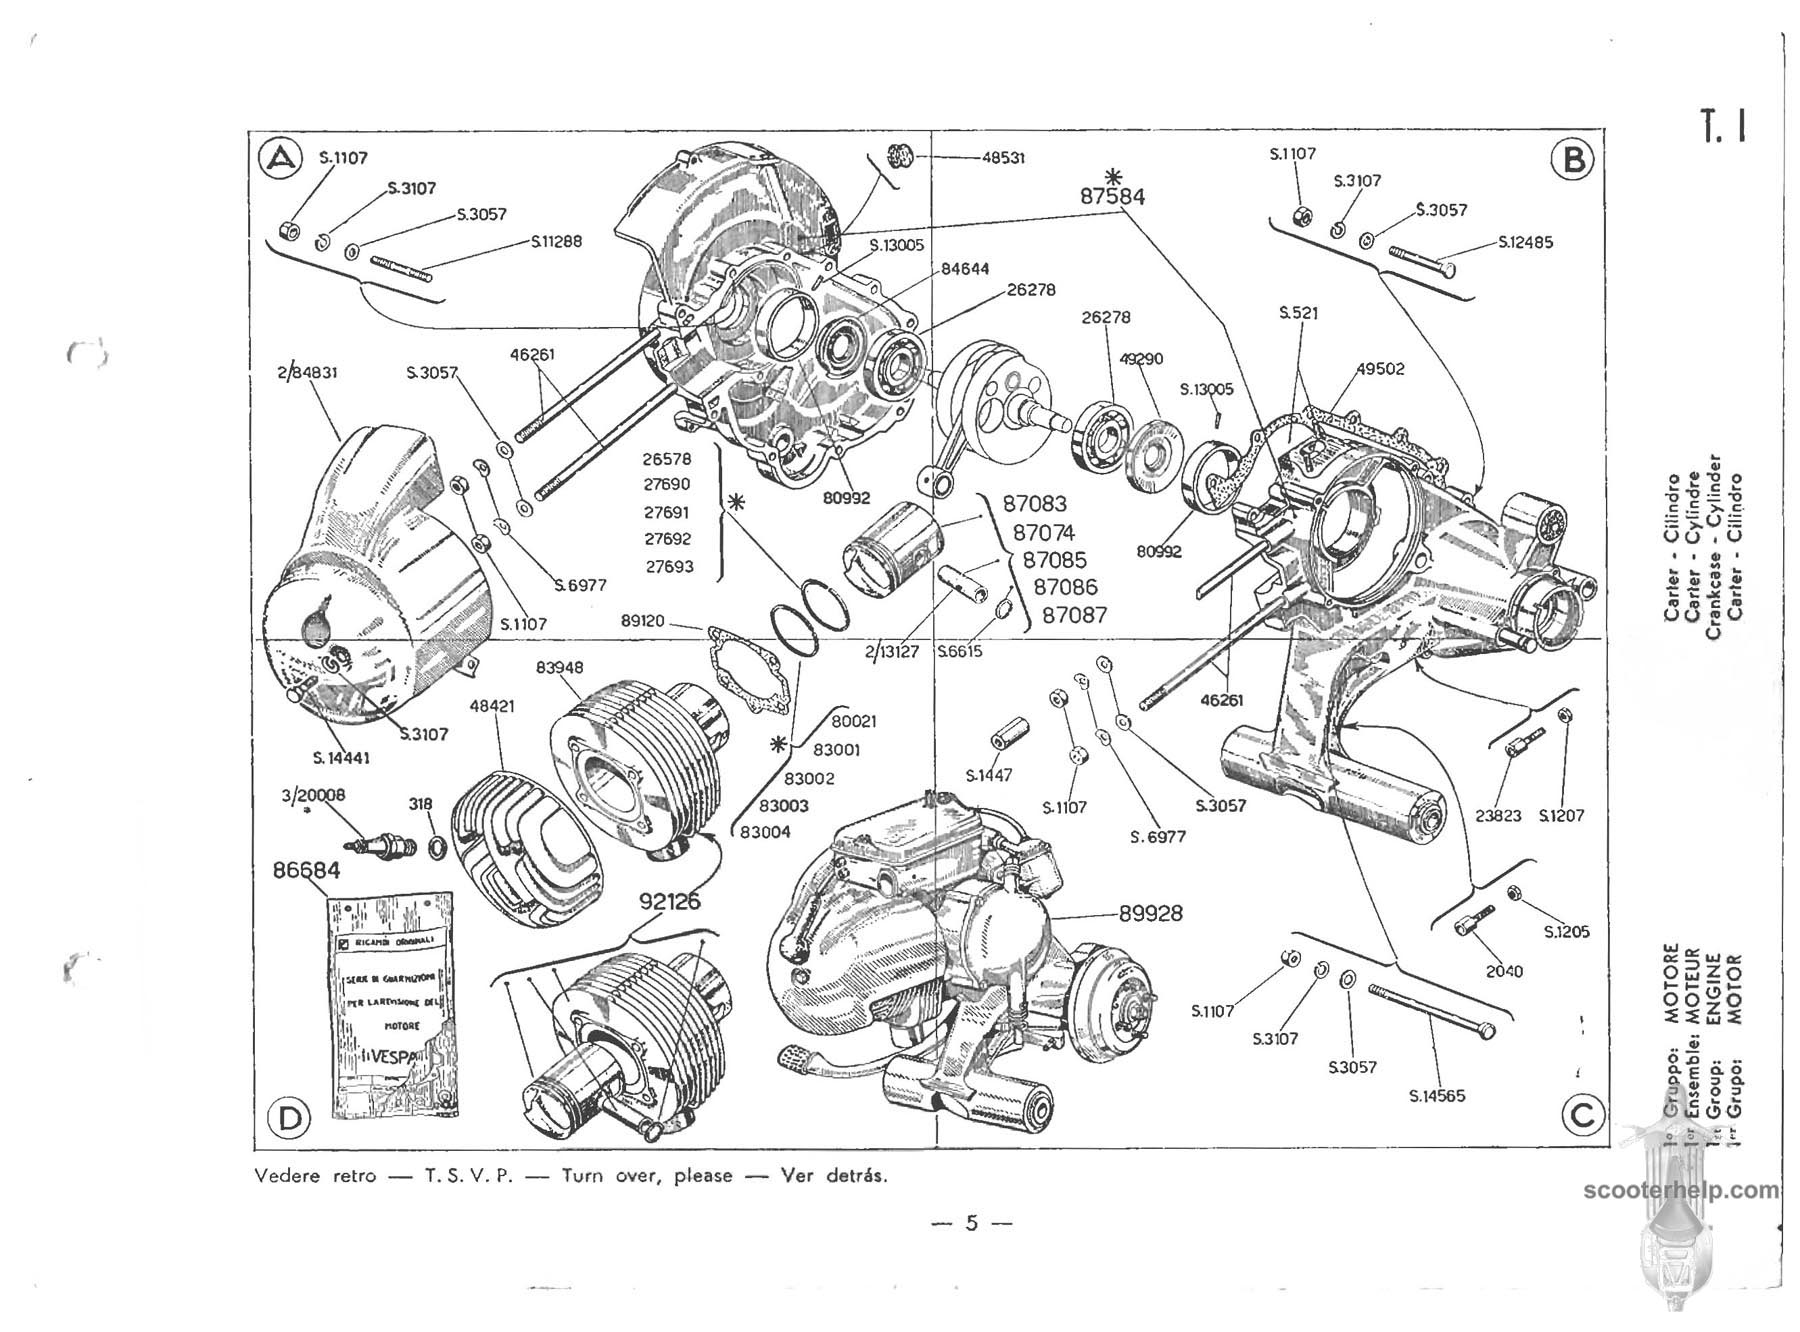 Modern Vespa Bad Crank Bearings Engine Cutting Out